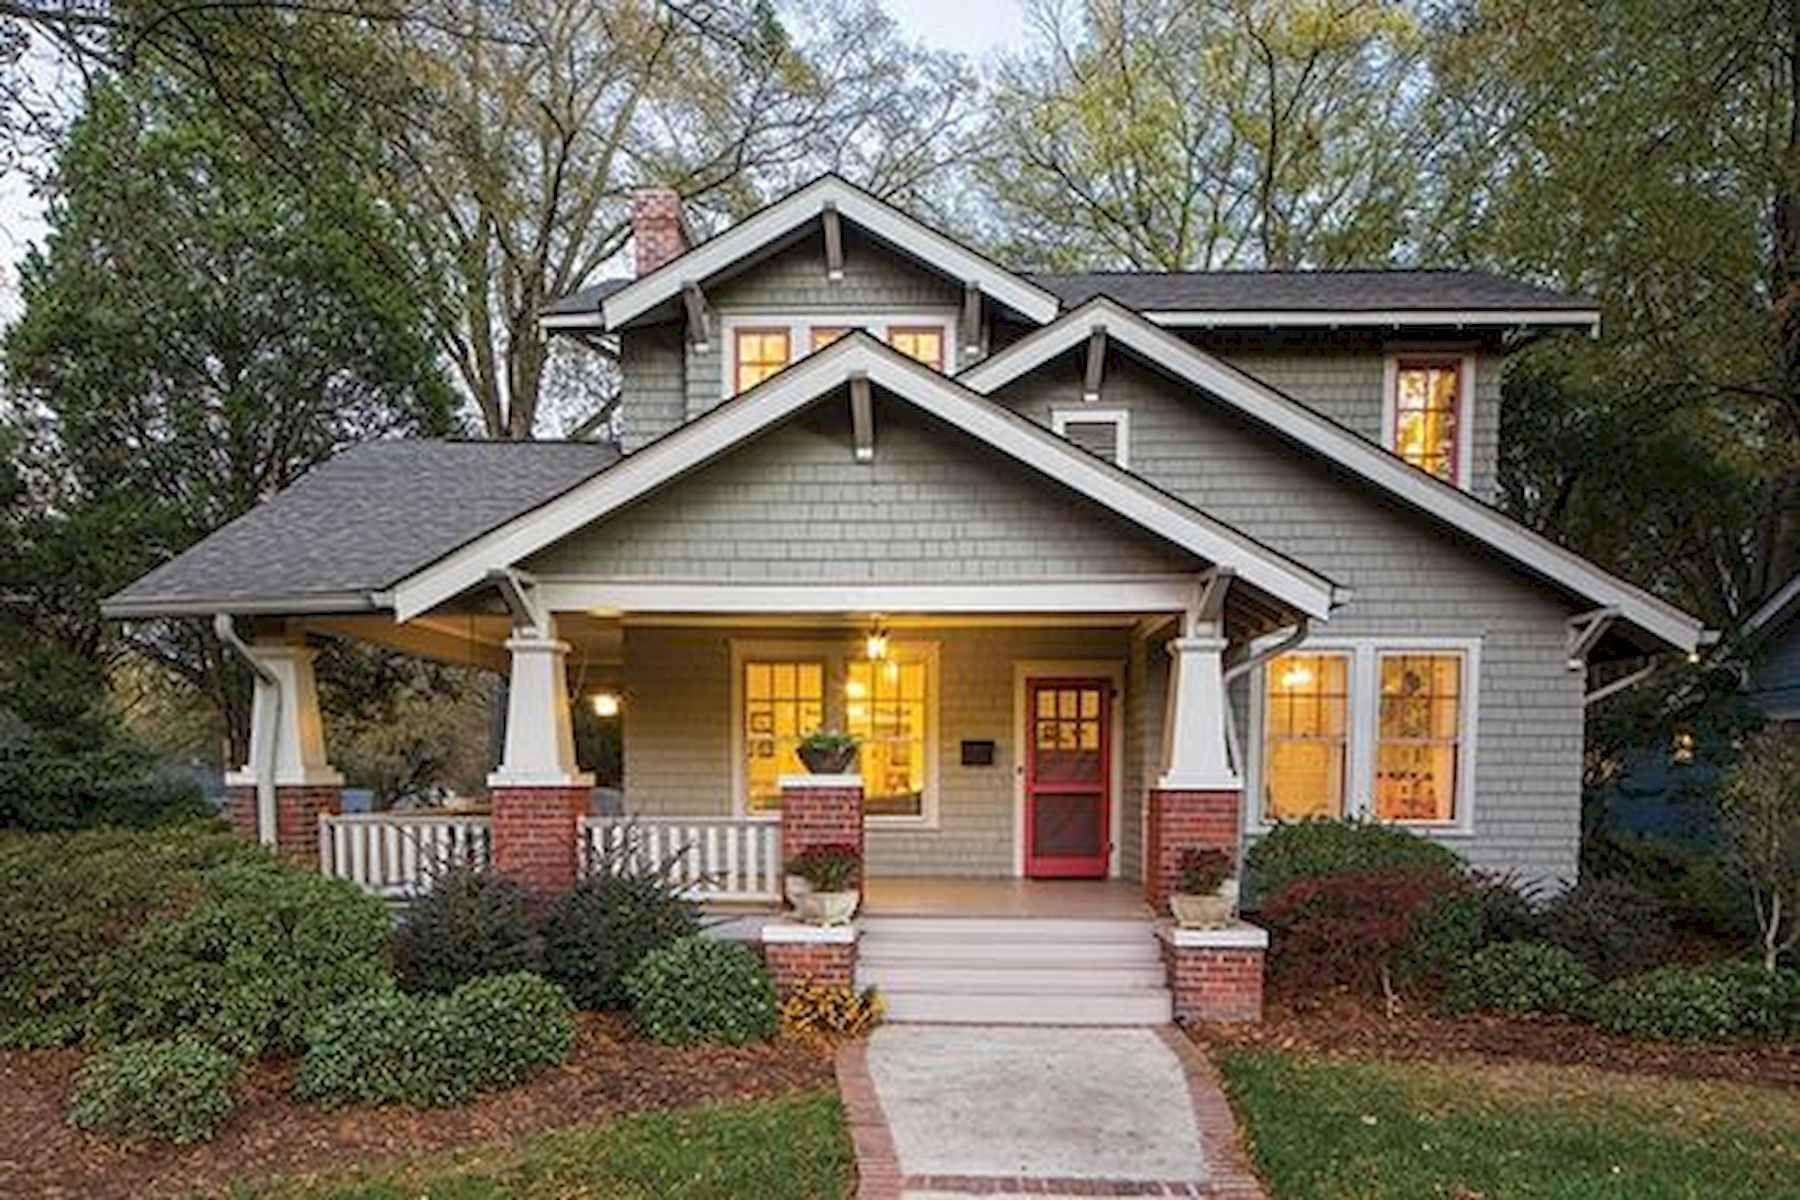 40 Amazing Craftsman Style Homes Design Ideas (19 #craftsmanstylehomes